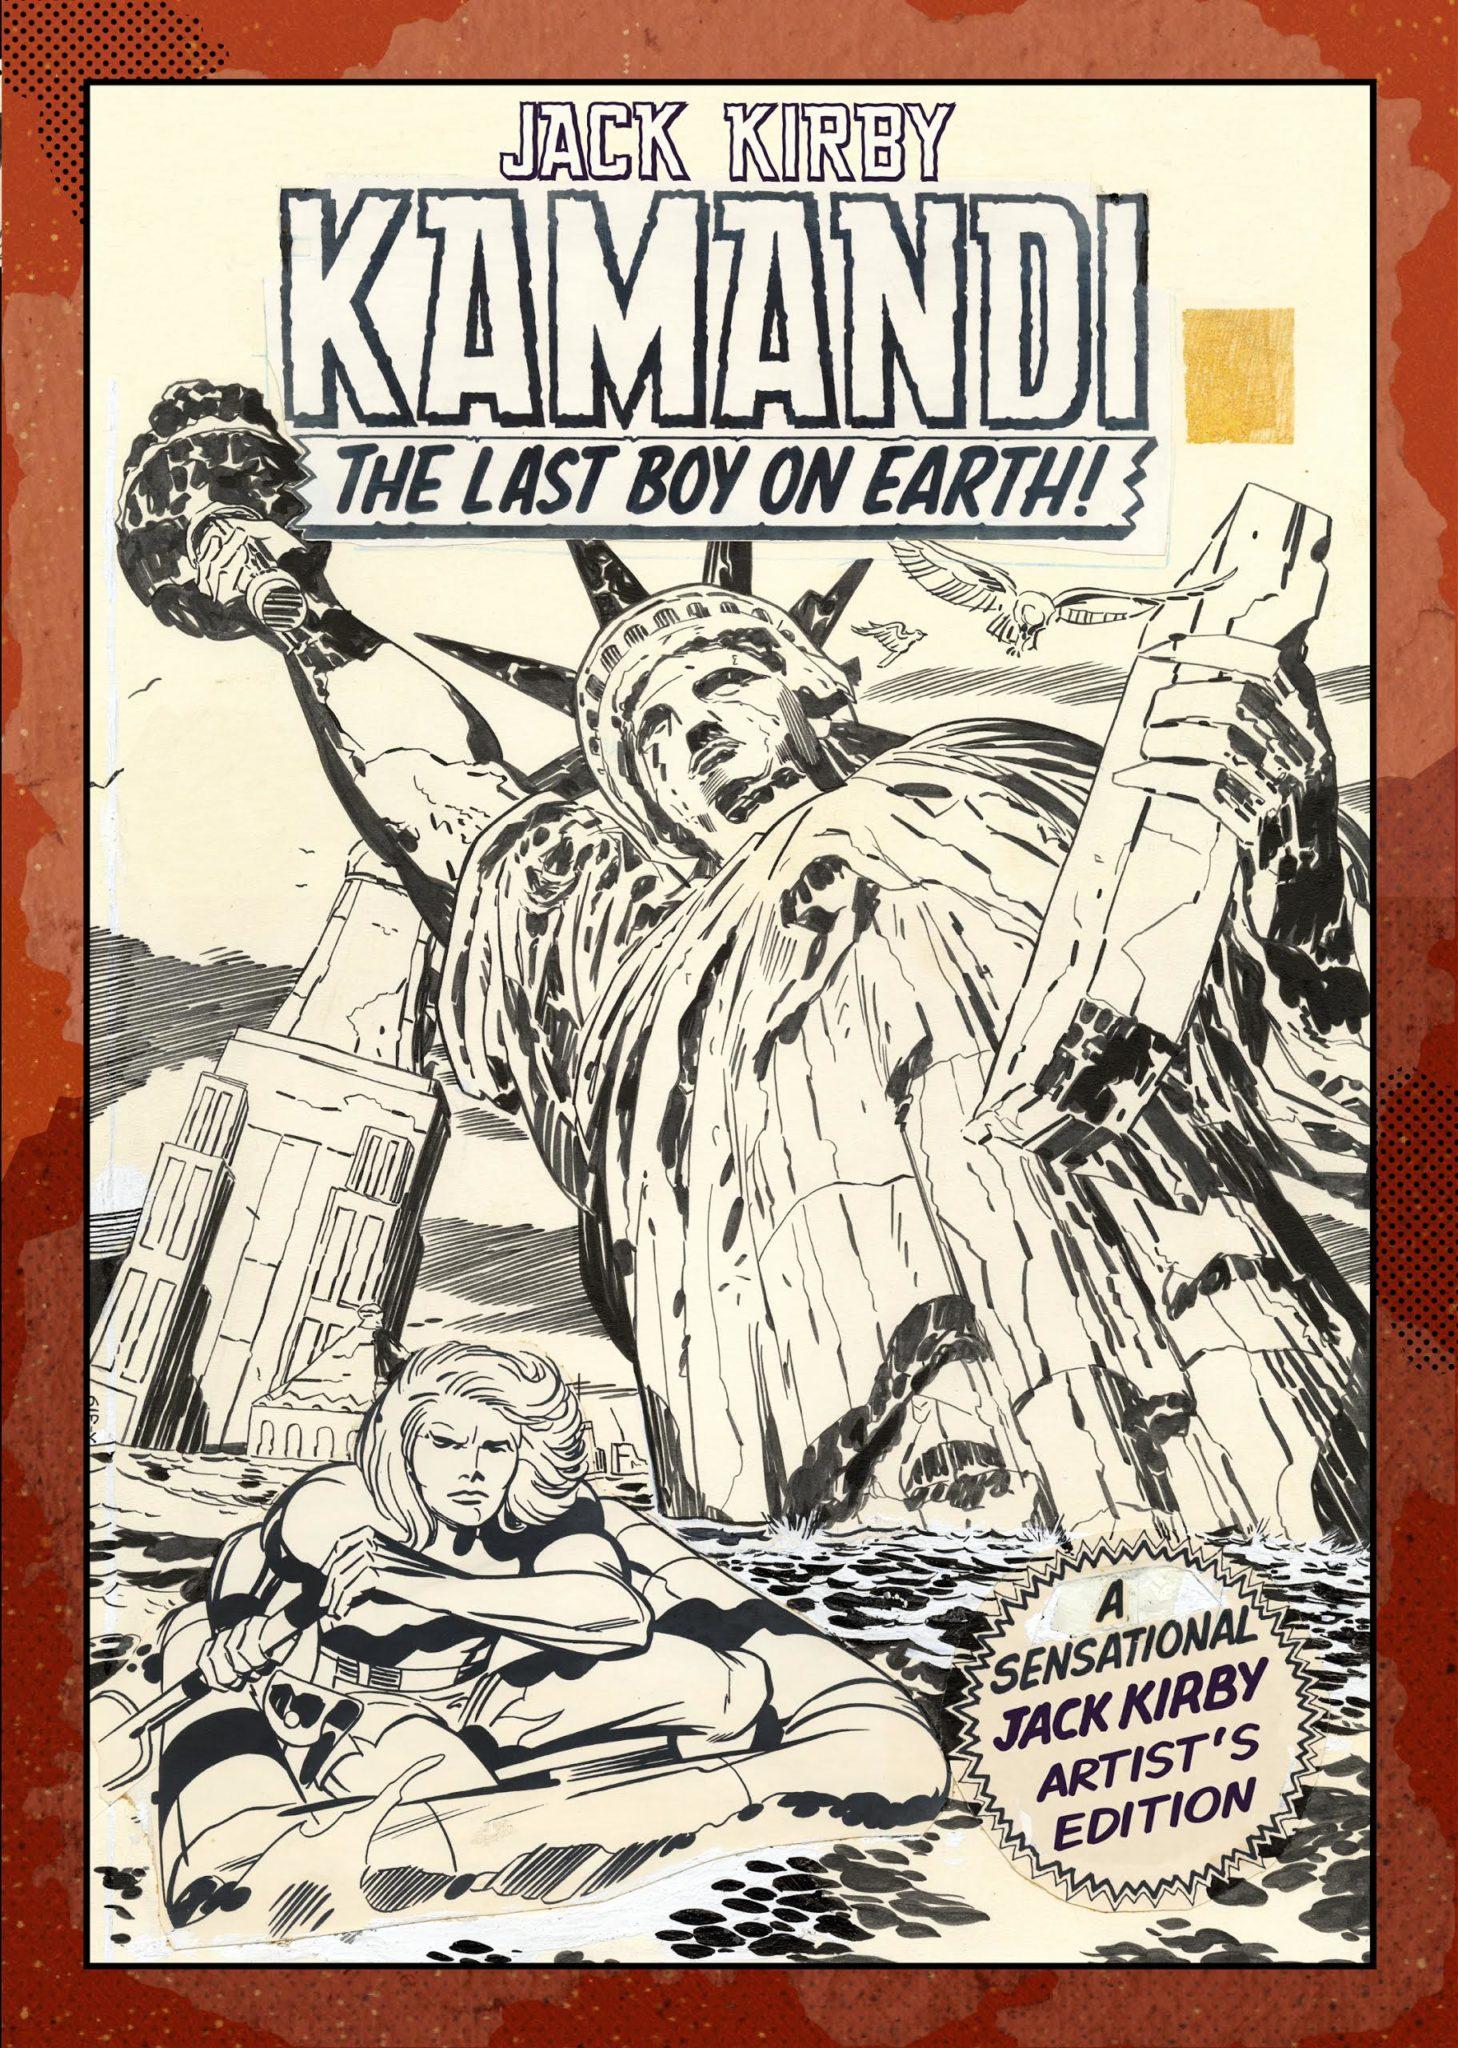 Review | Jack Kirby Kamandi The Last Boy On Earth Artist's Edition Vol 1